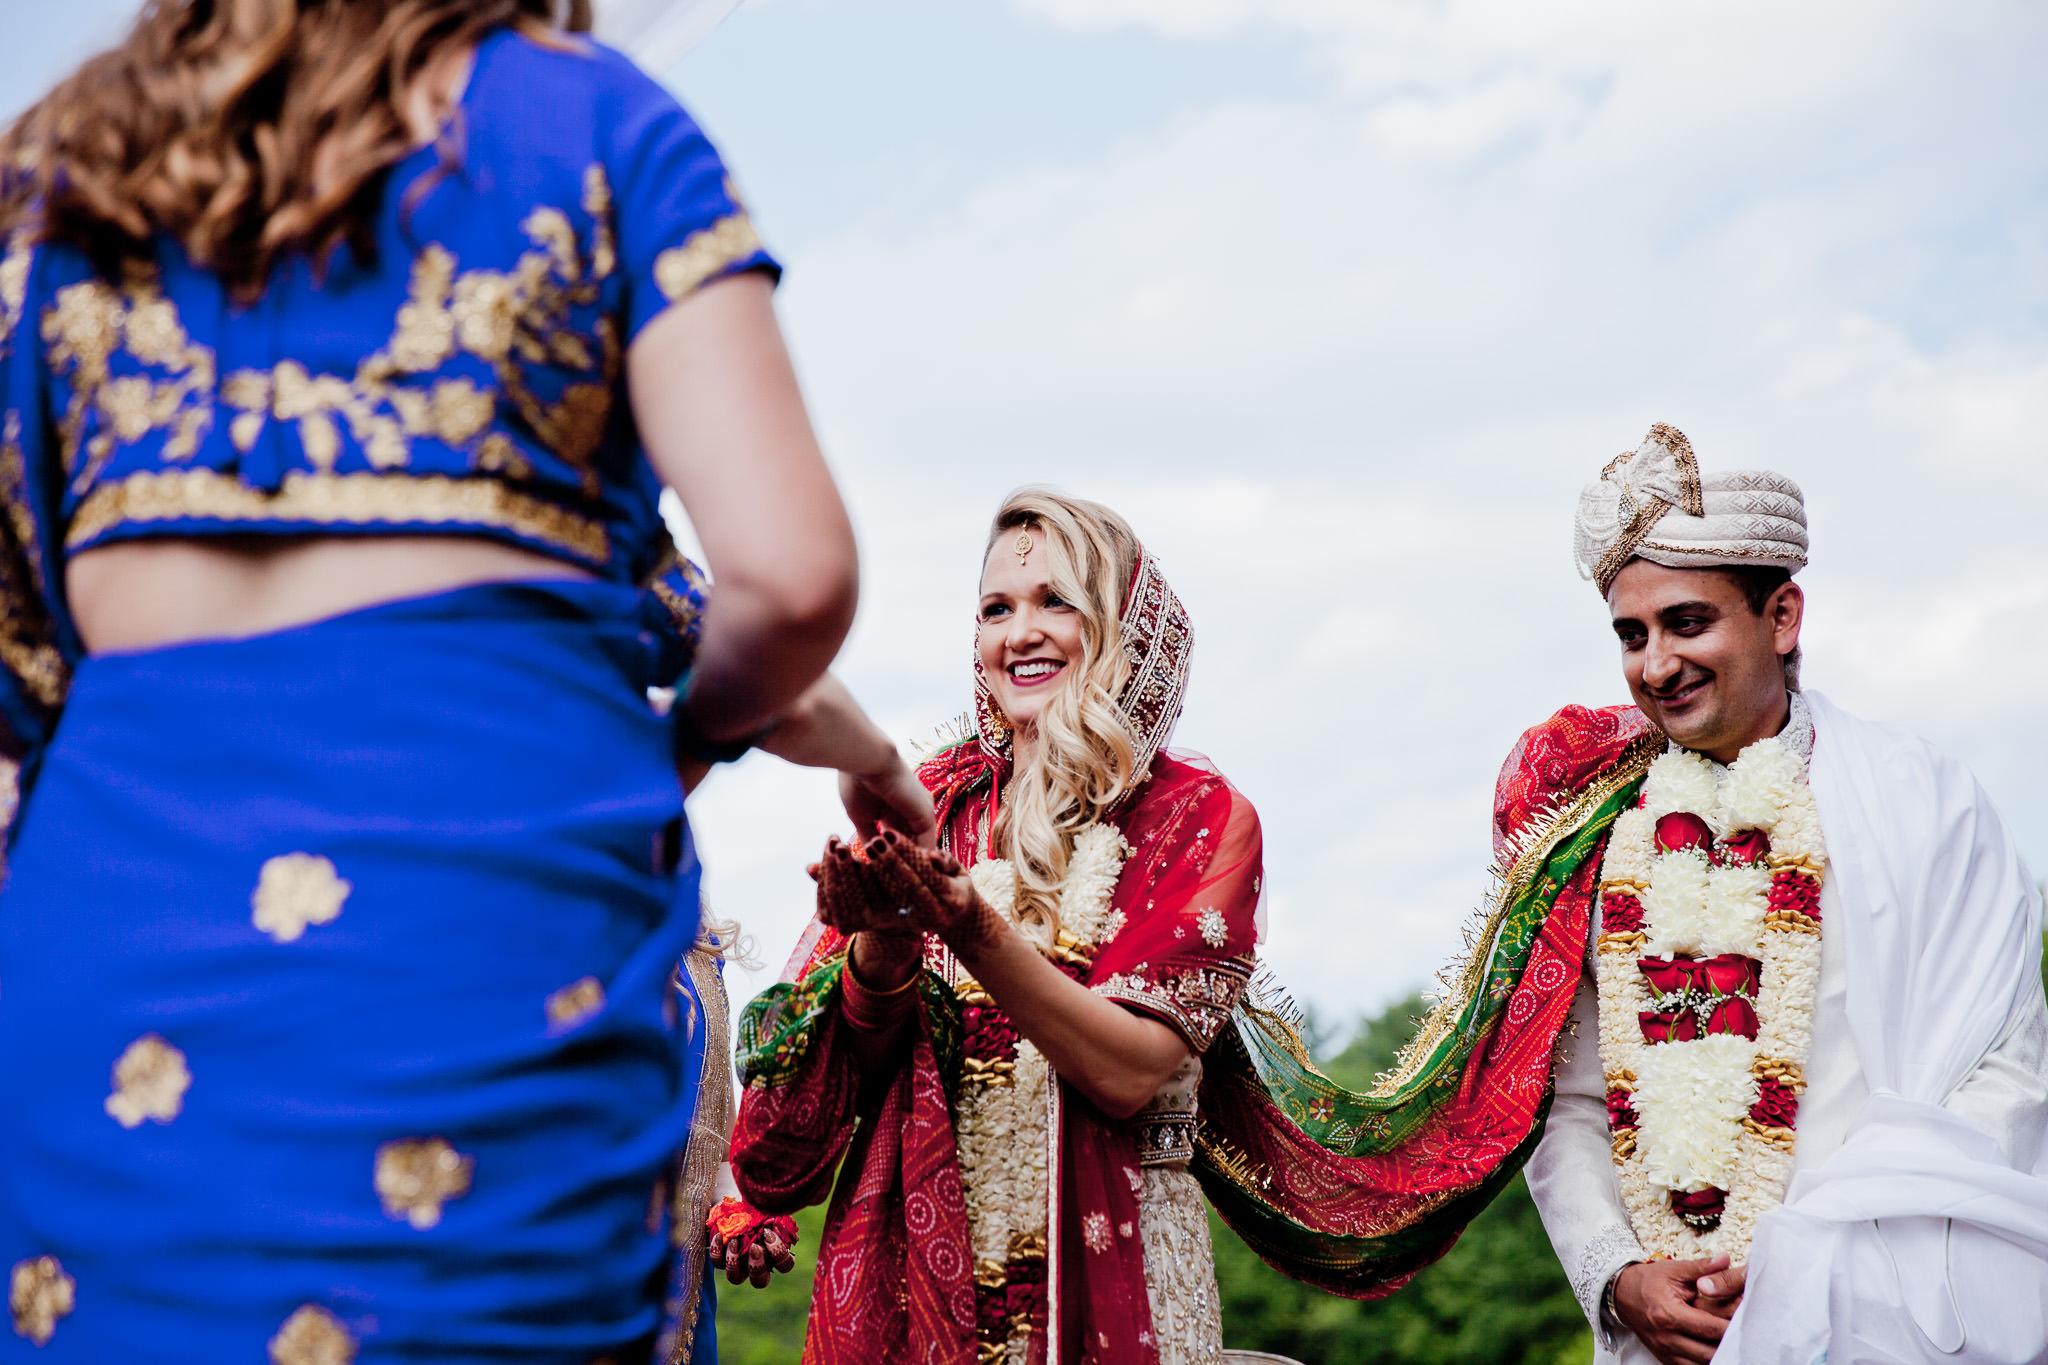 035_Canada-documentary-wedding-photograp